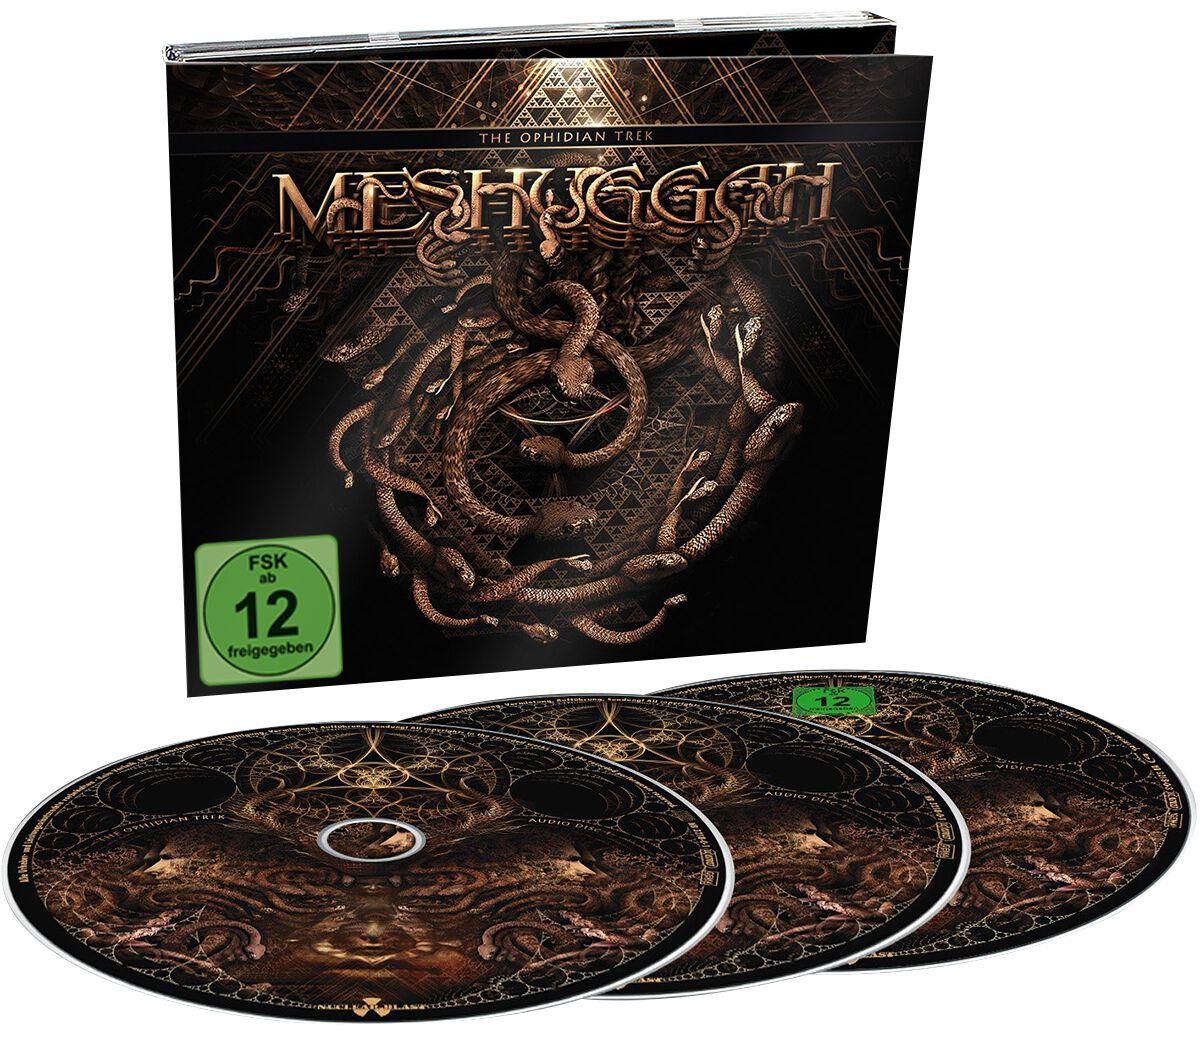 Image of Meshuggah The ophidian trek 2-CD & Blu-ray Standard